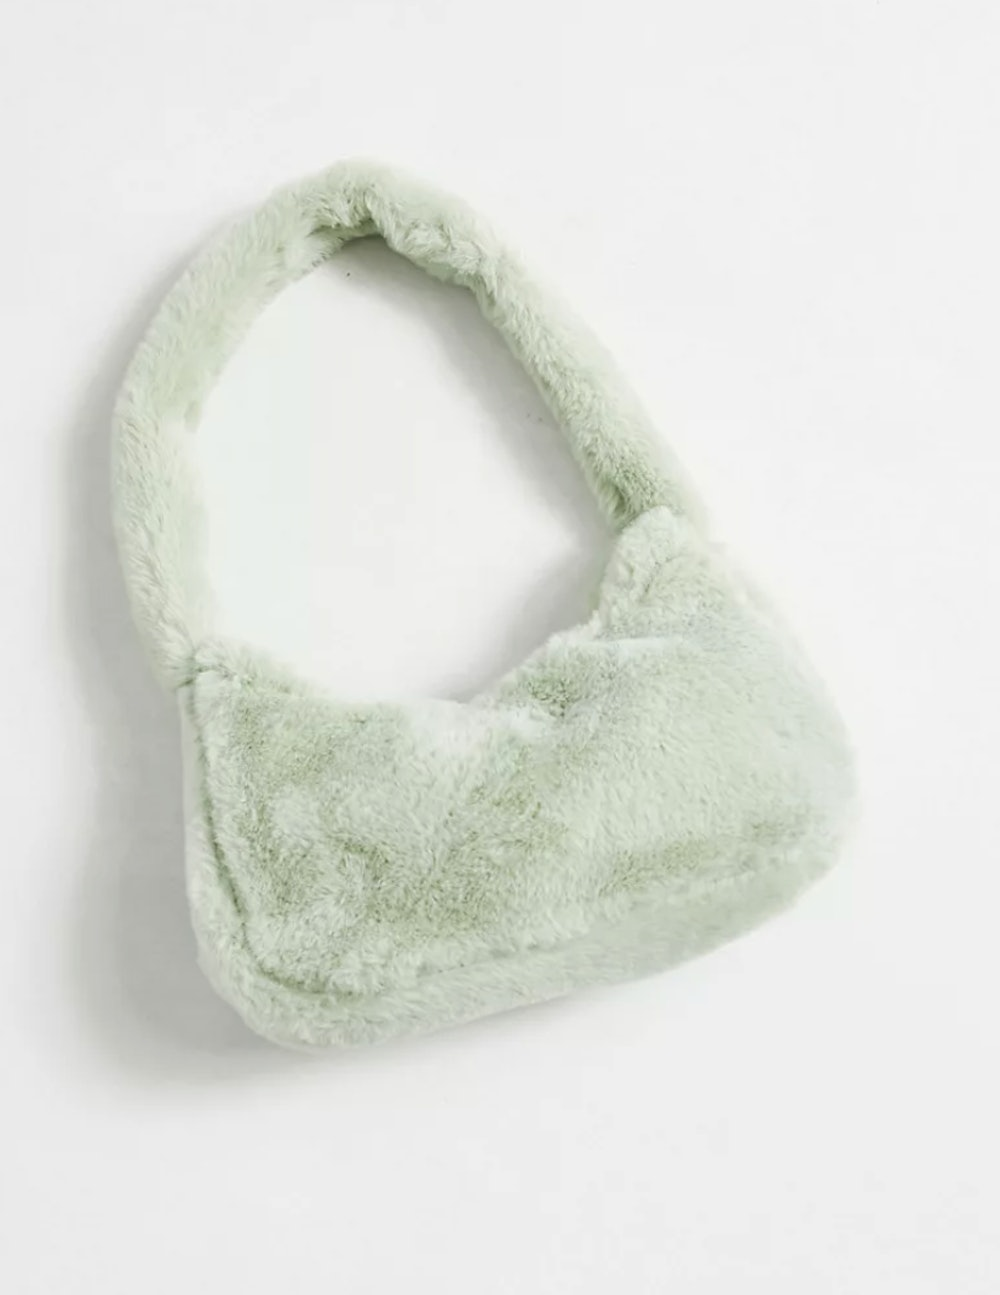 90s shoulder bag in plush sage green faux fur